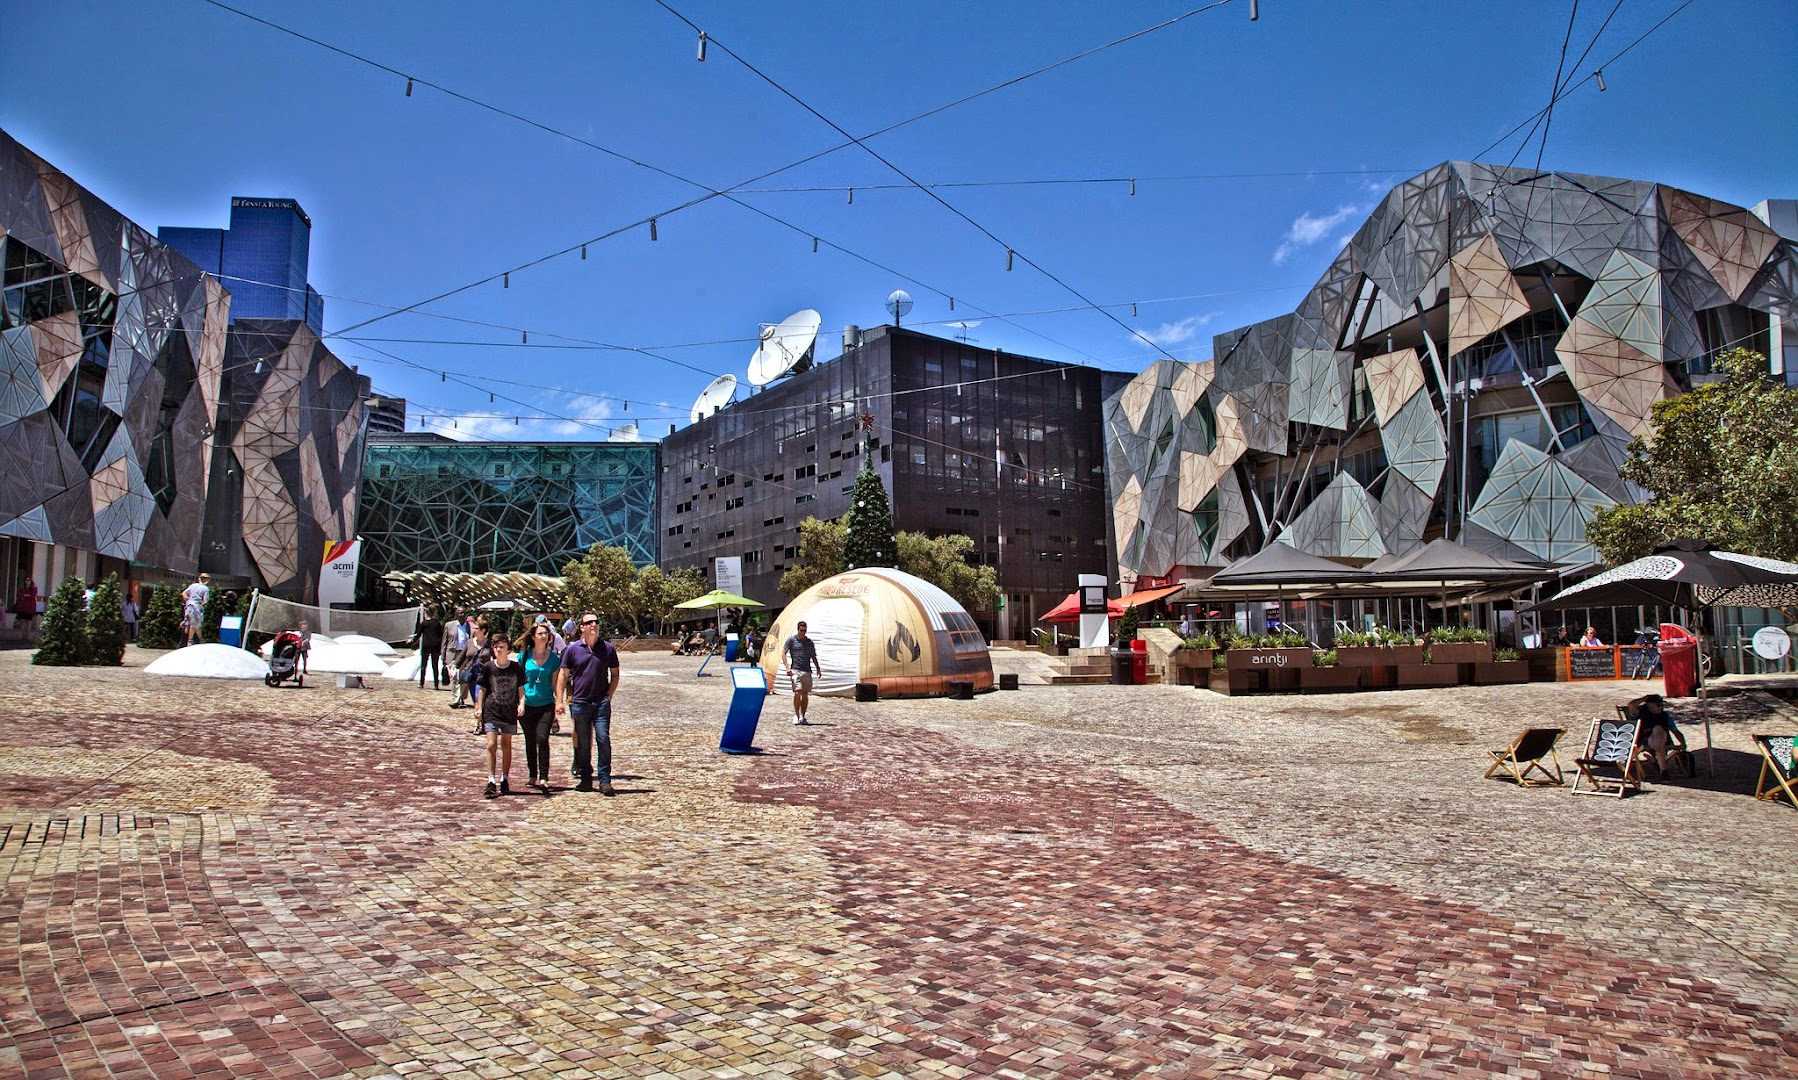 Main square of Melbourne